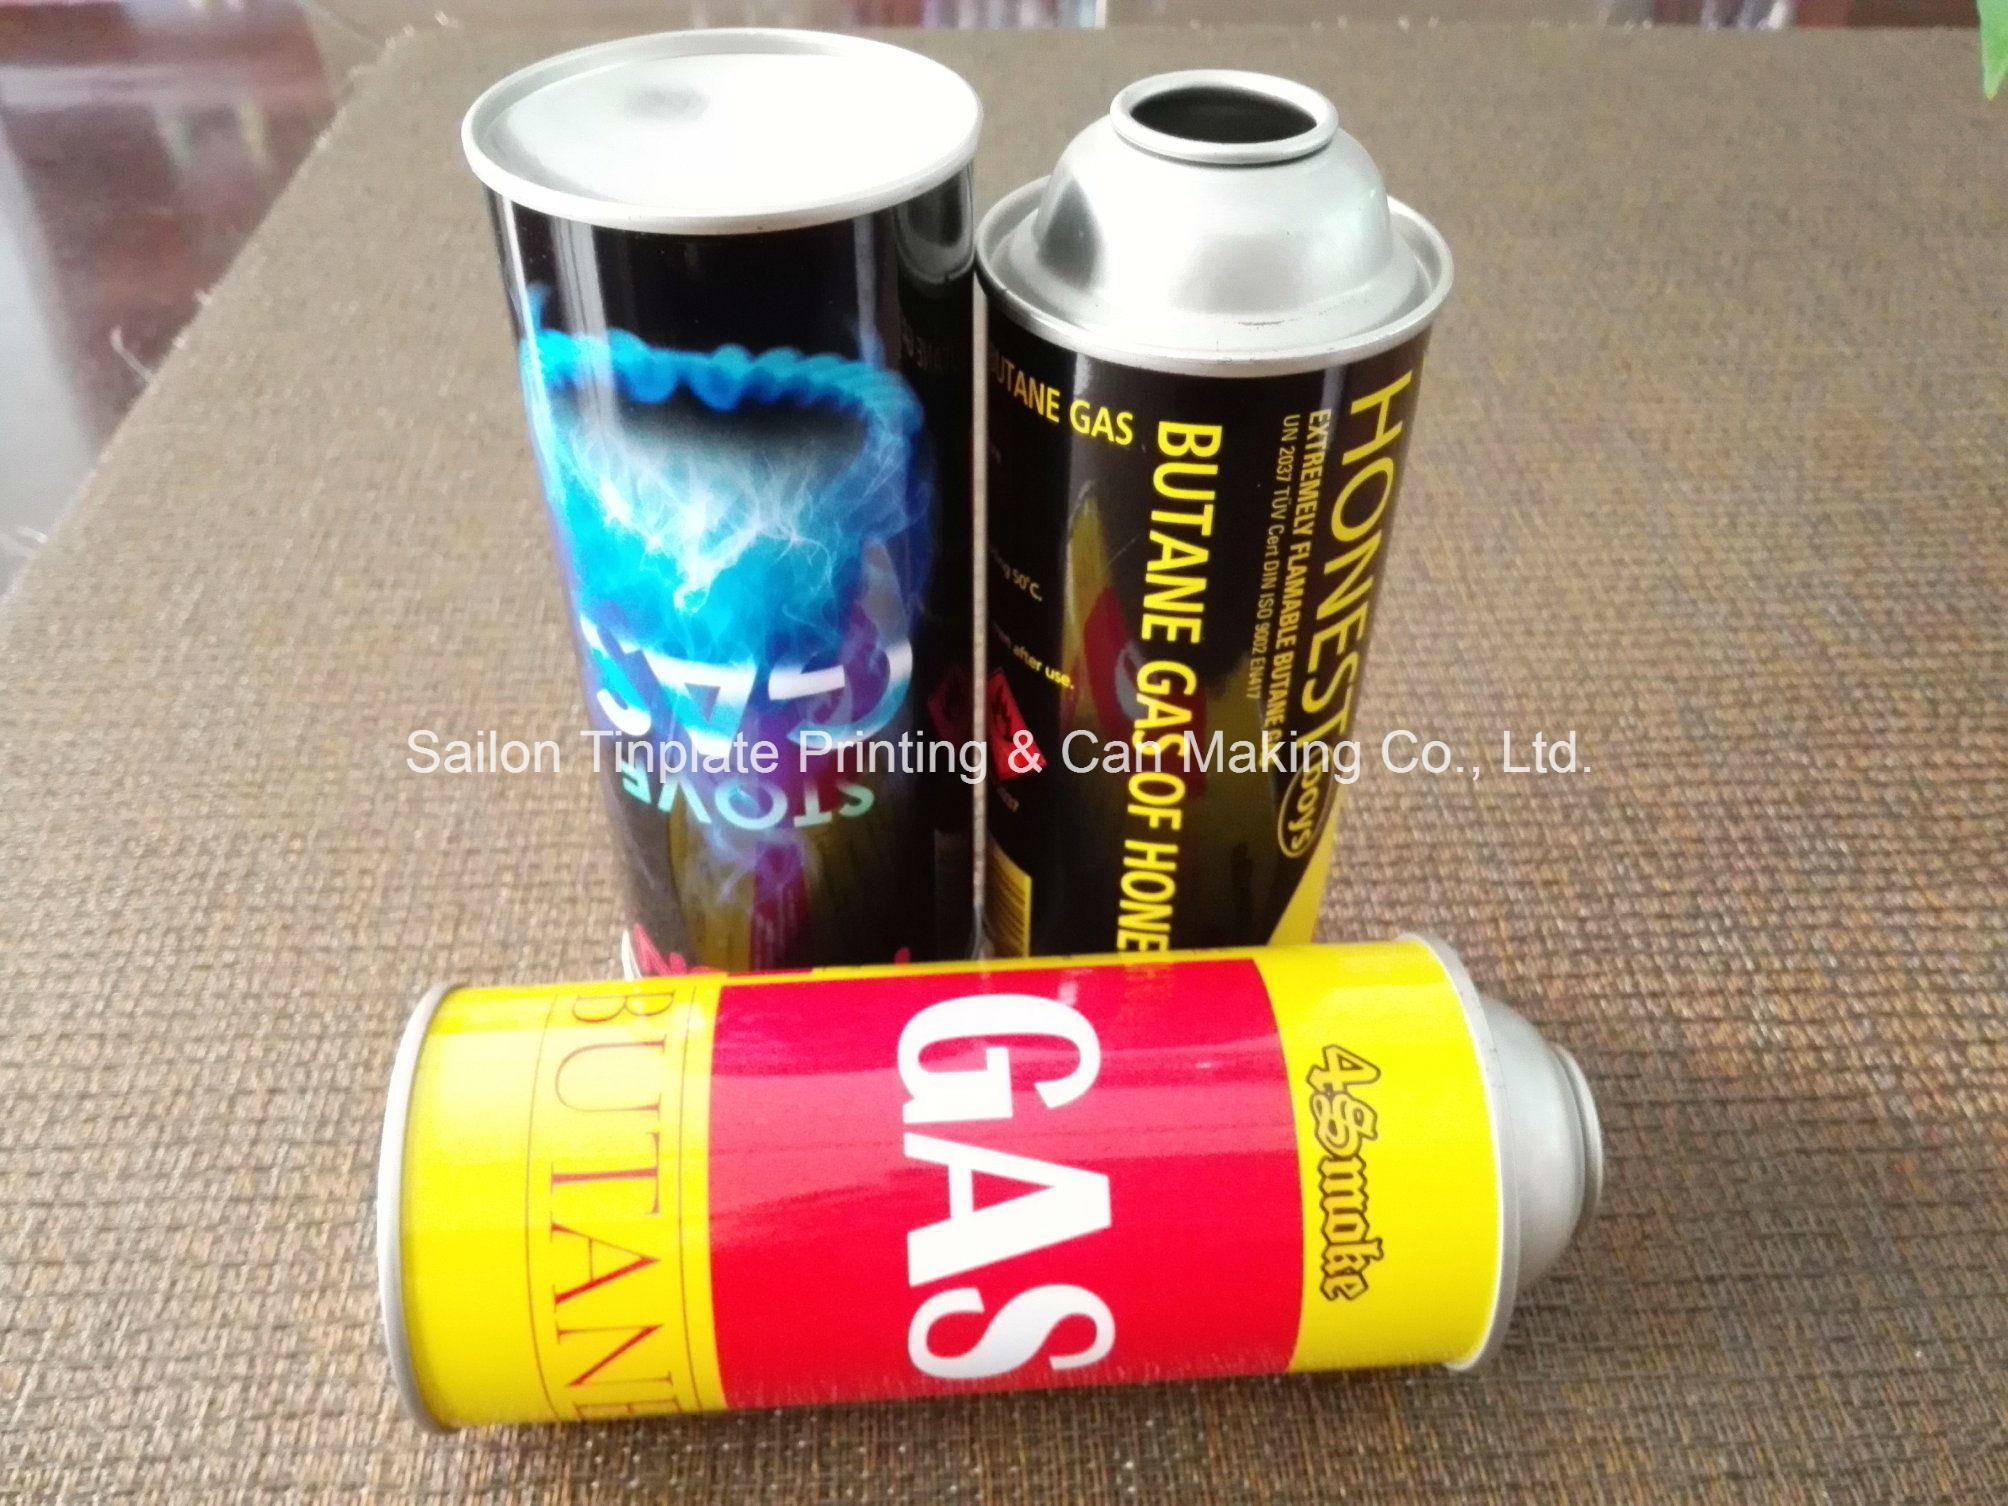 Portable Butane Gas Cartridge From Sailon China